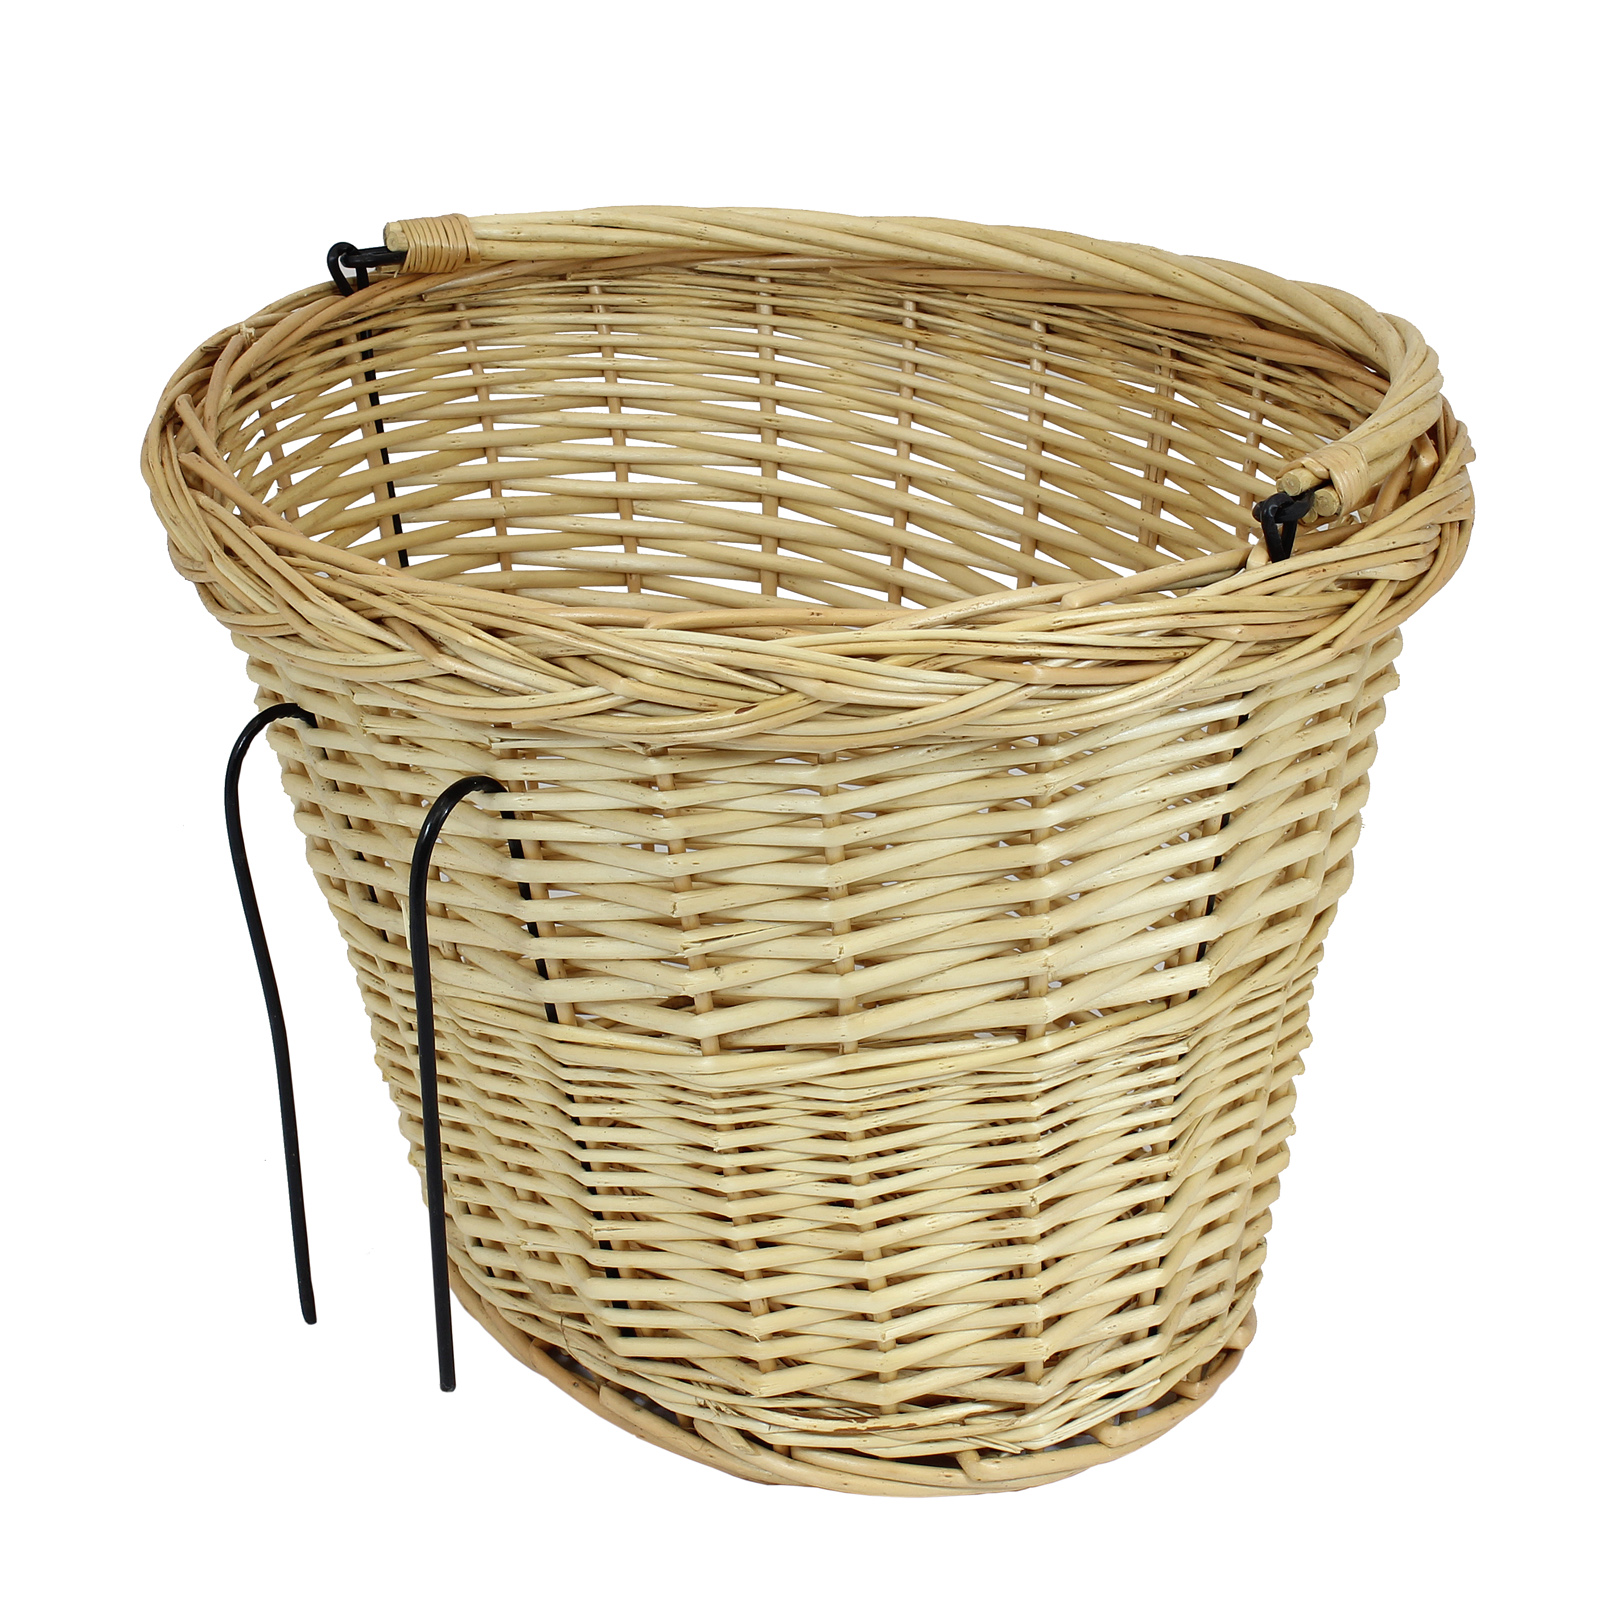 Wicker Bike Basket With Handle : Bicycle wicker basket handle cycle bike classic ping